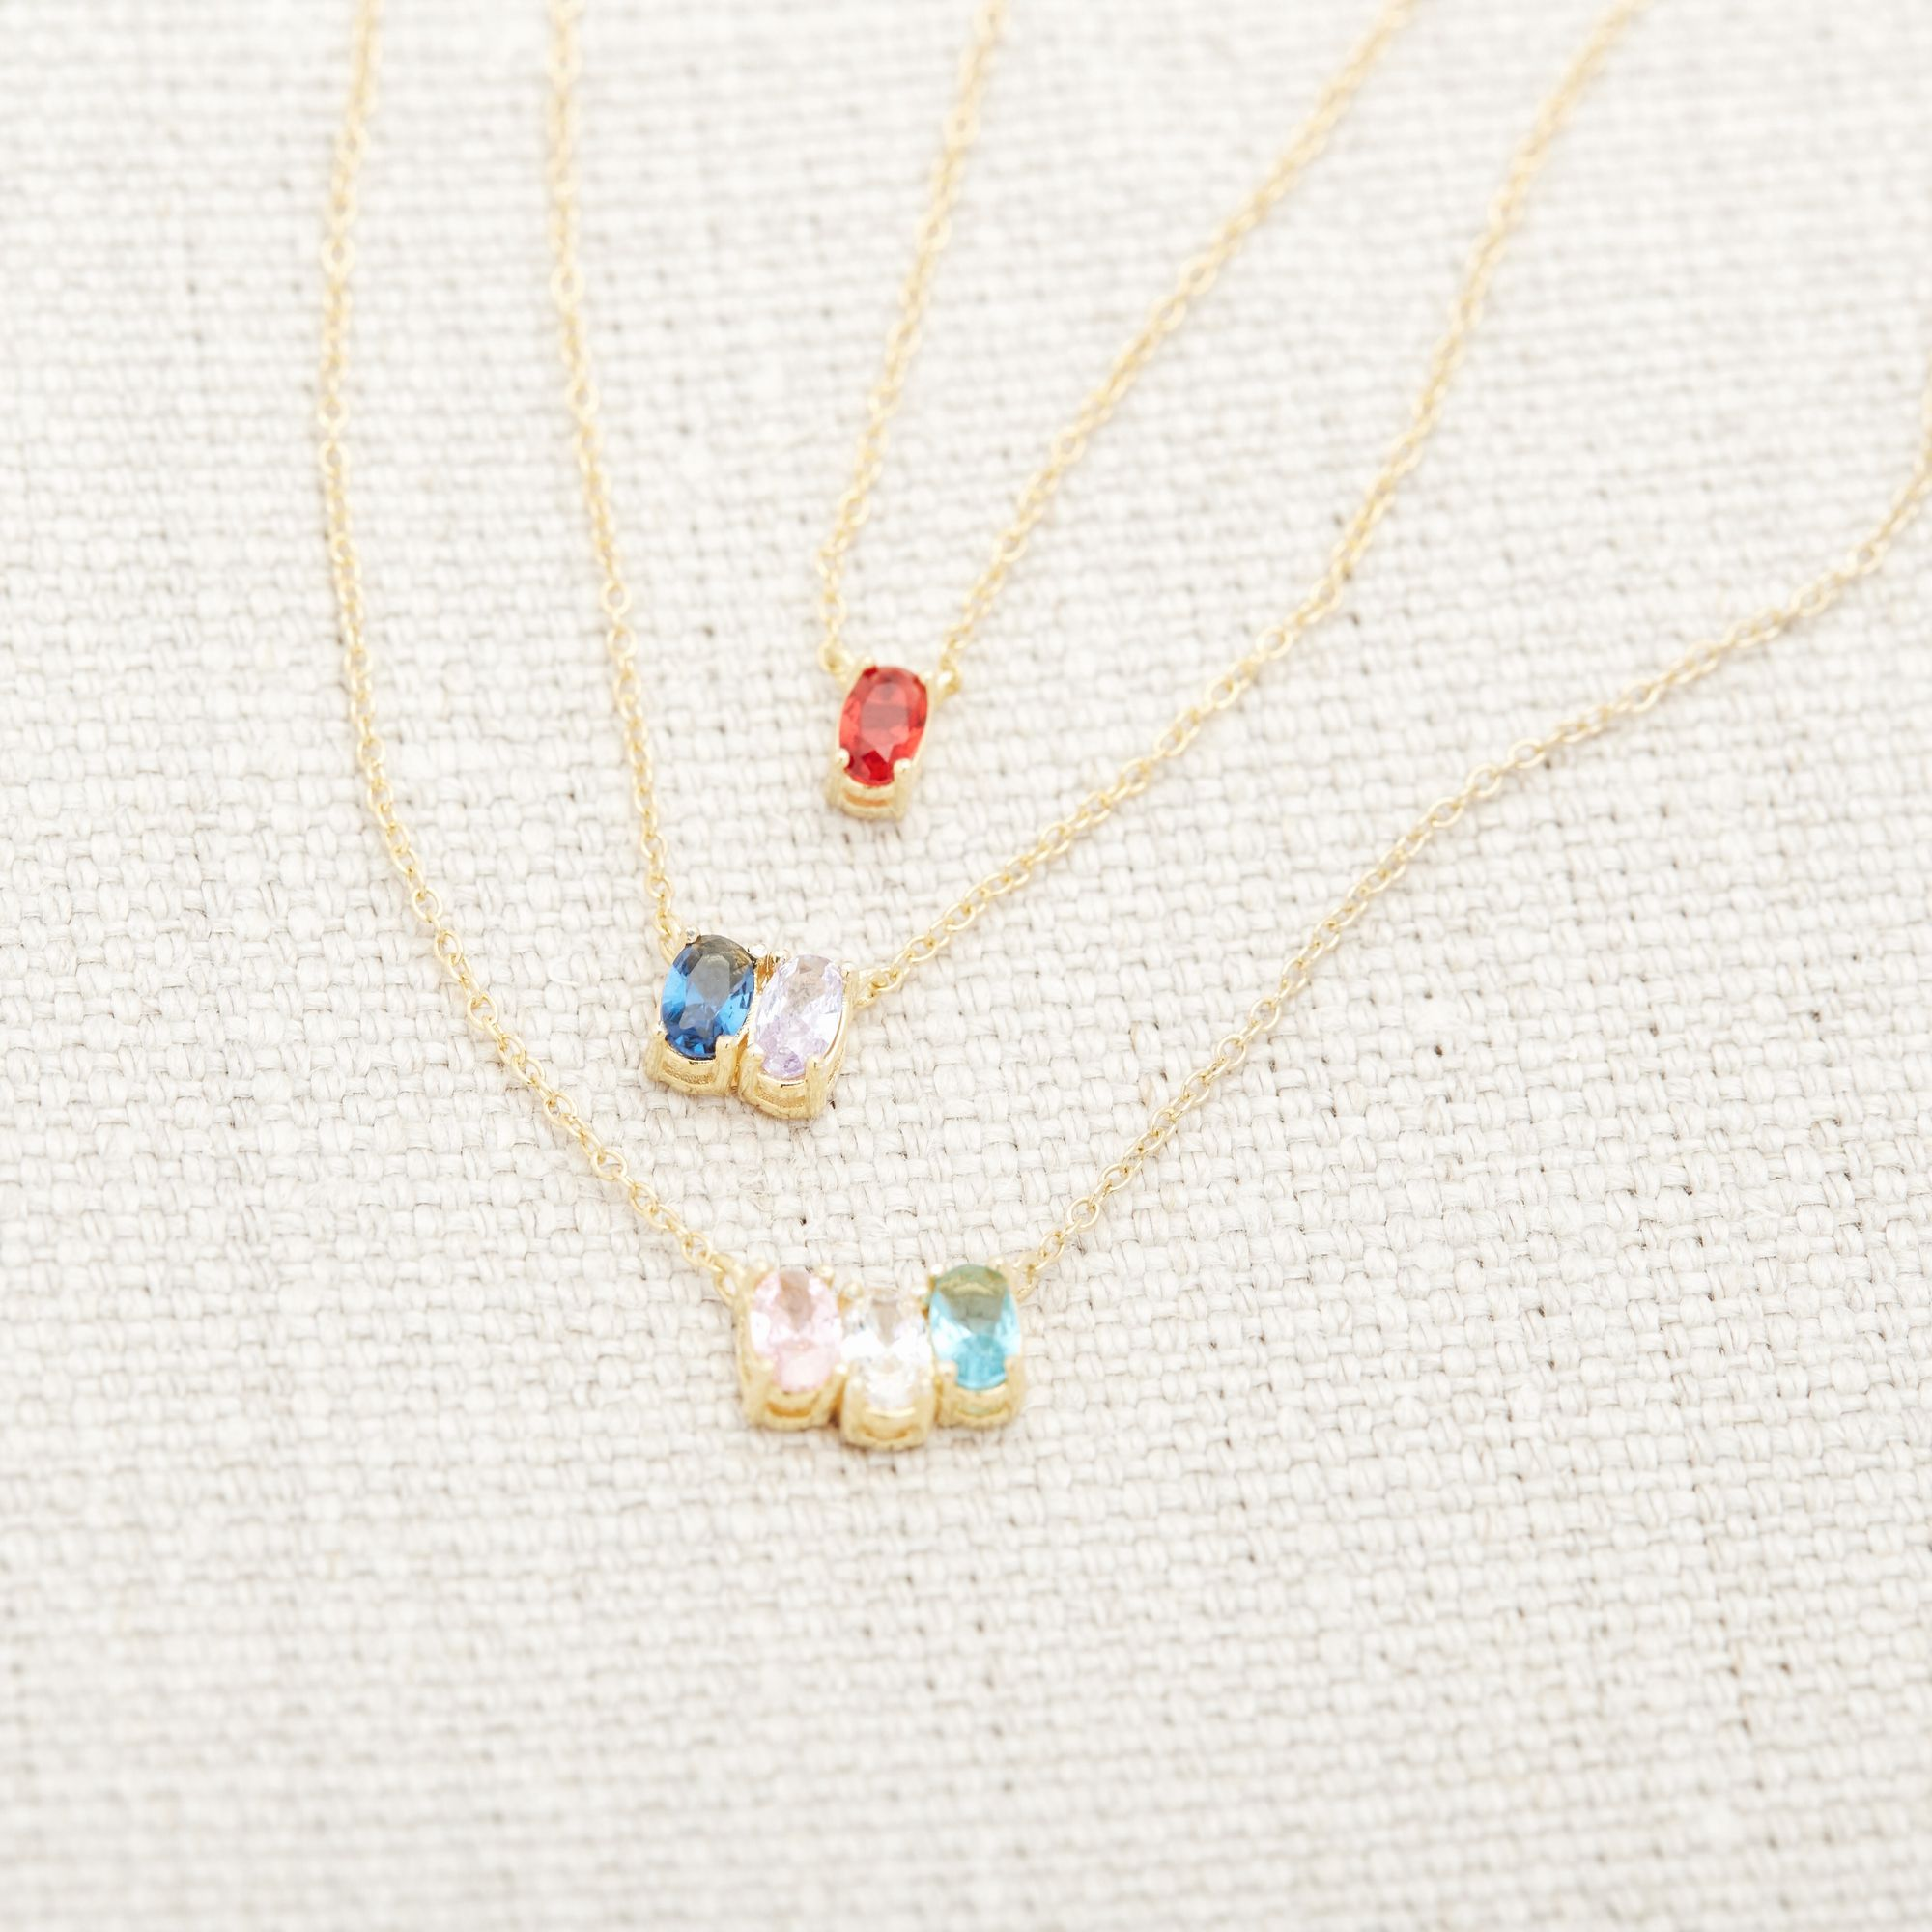 Pin On Birthstone Jewelry